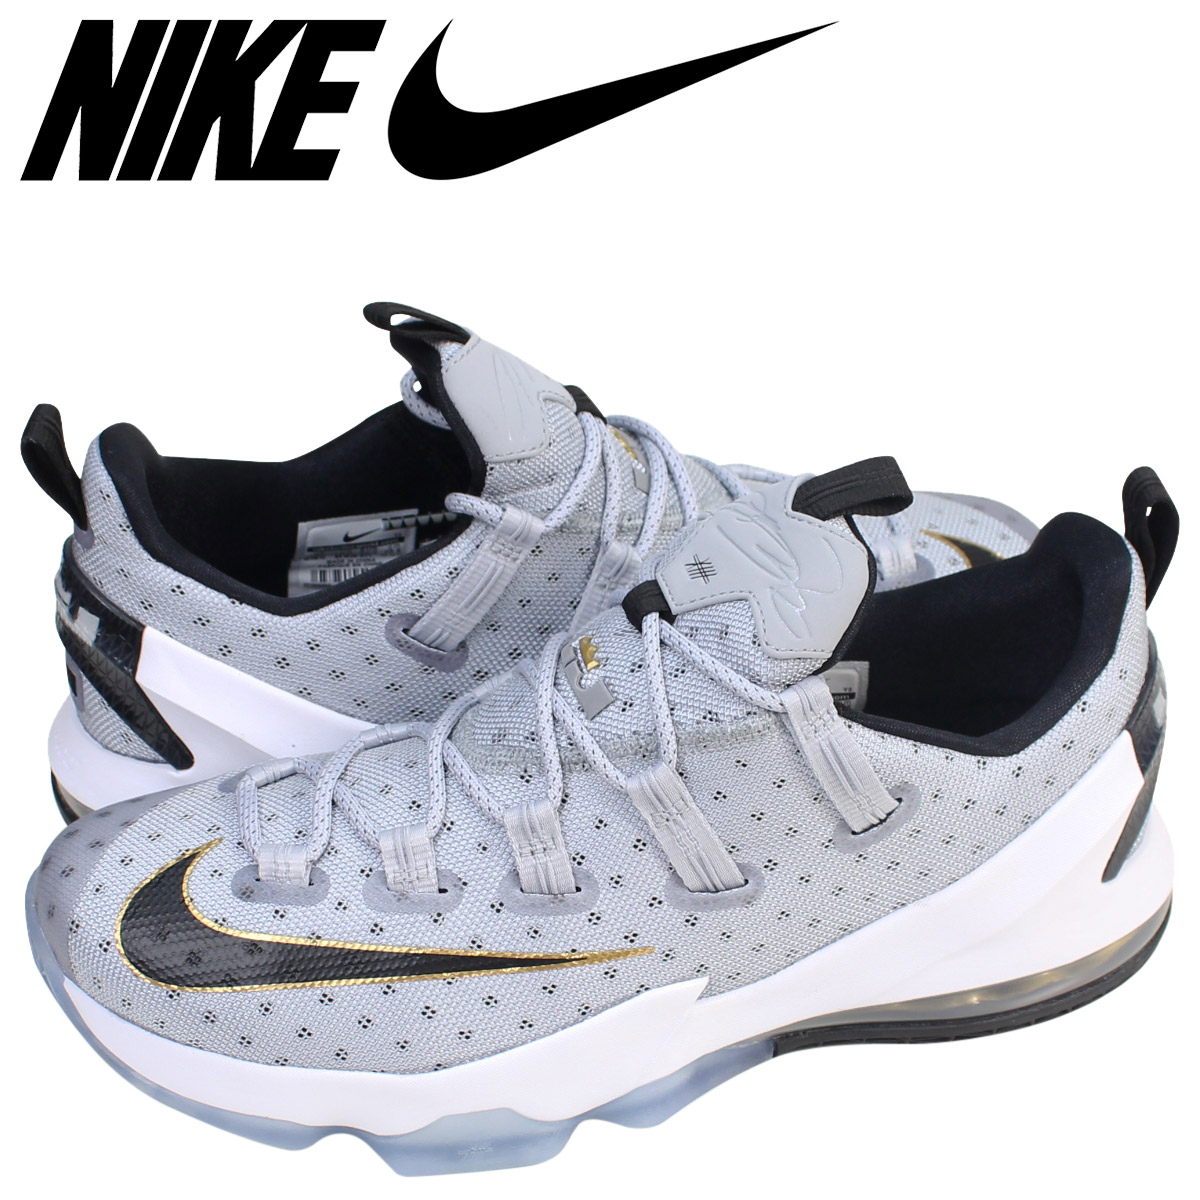 reputable site 9c7a1 90e0e NIKE Nike Revlon 13 sneakers LEBRON 13 LOW EP 831,926-071 men's shoes gray